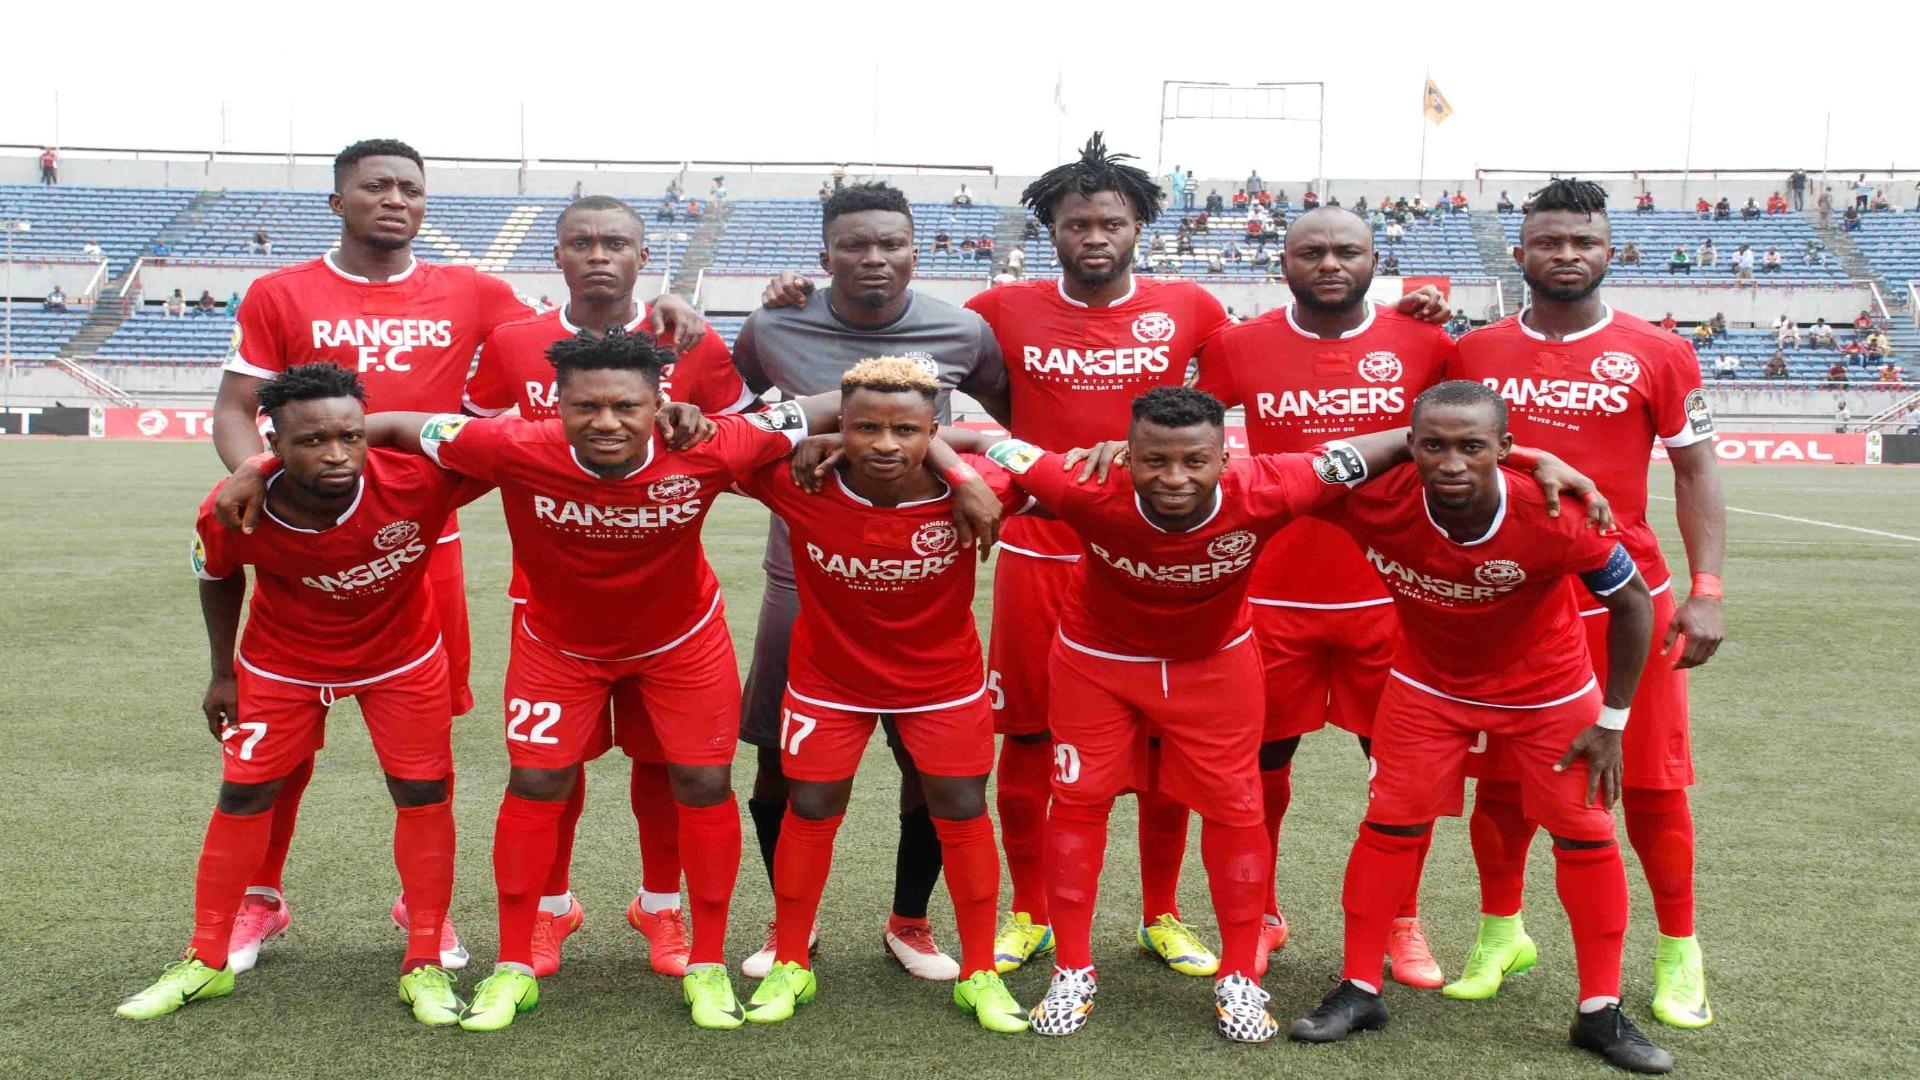 Npfl: Rangers Subdue Ifeanyi Uba Fc 3 1, Relieve Pressure In Enugu